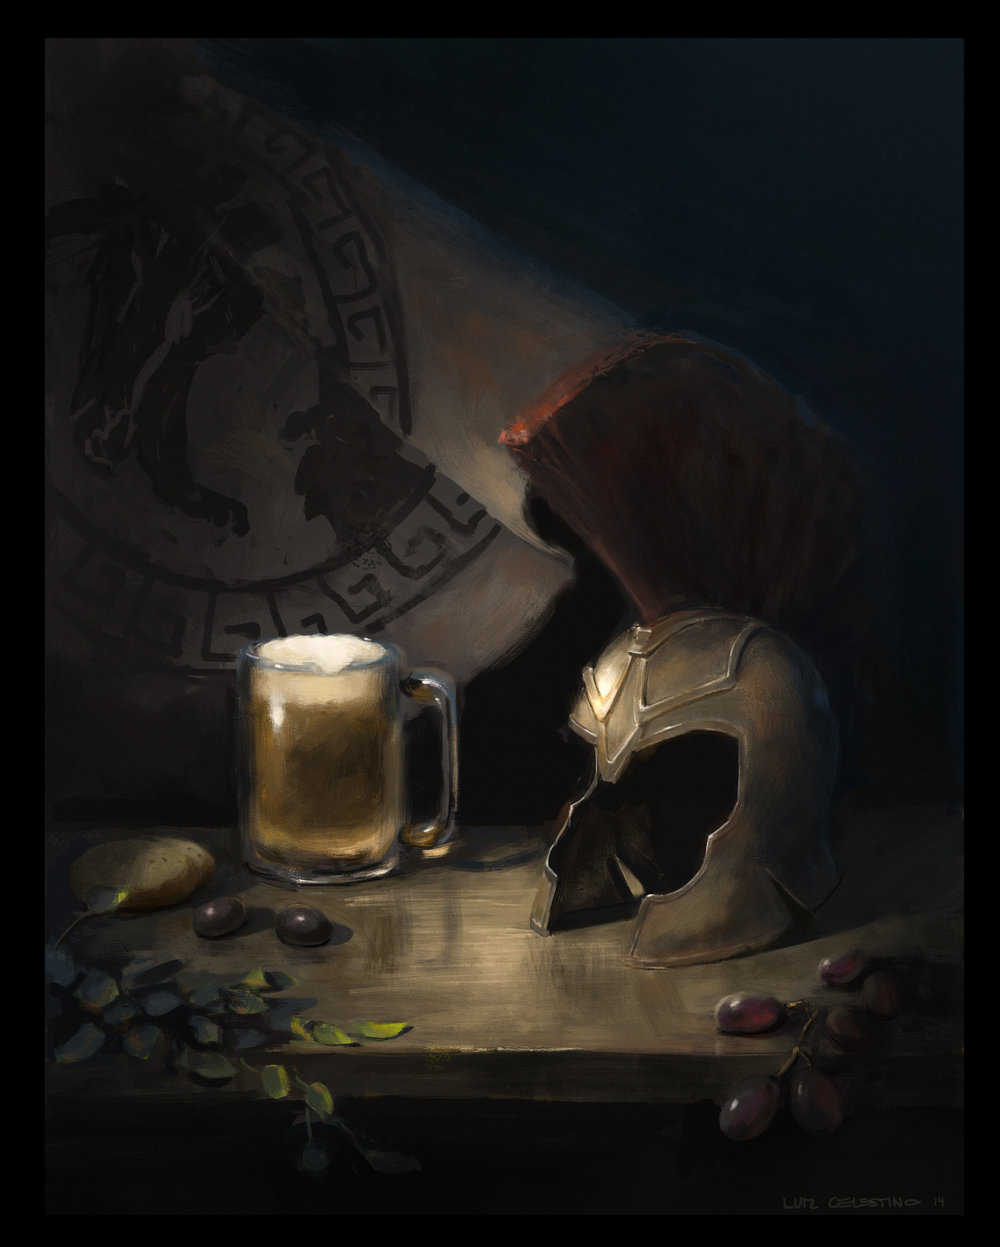 Arte de Luiz Celestino